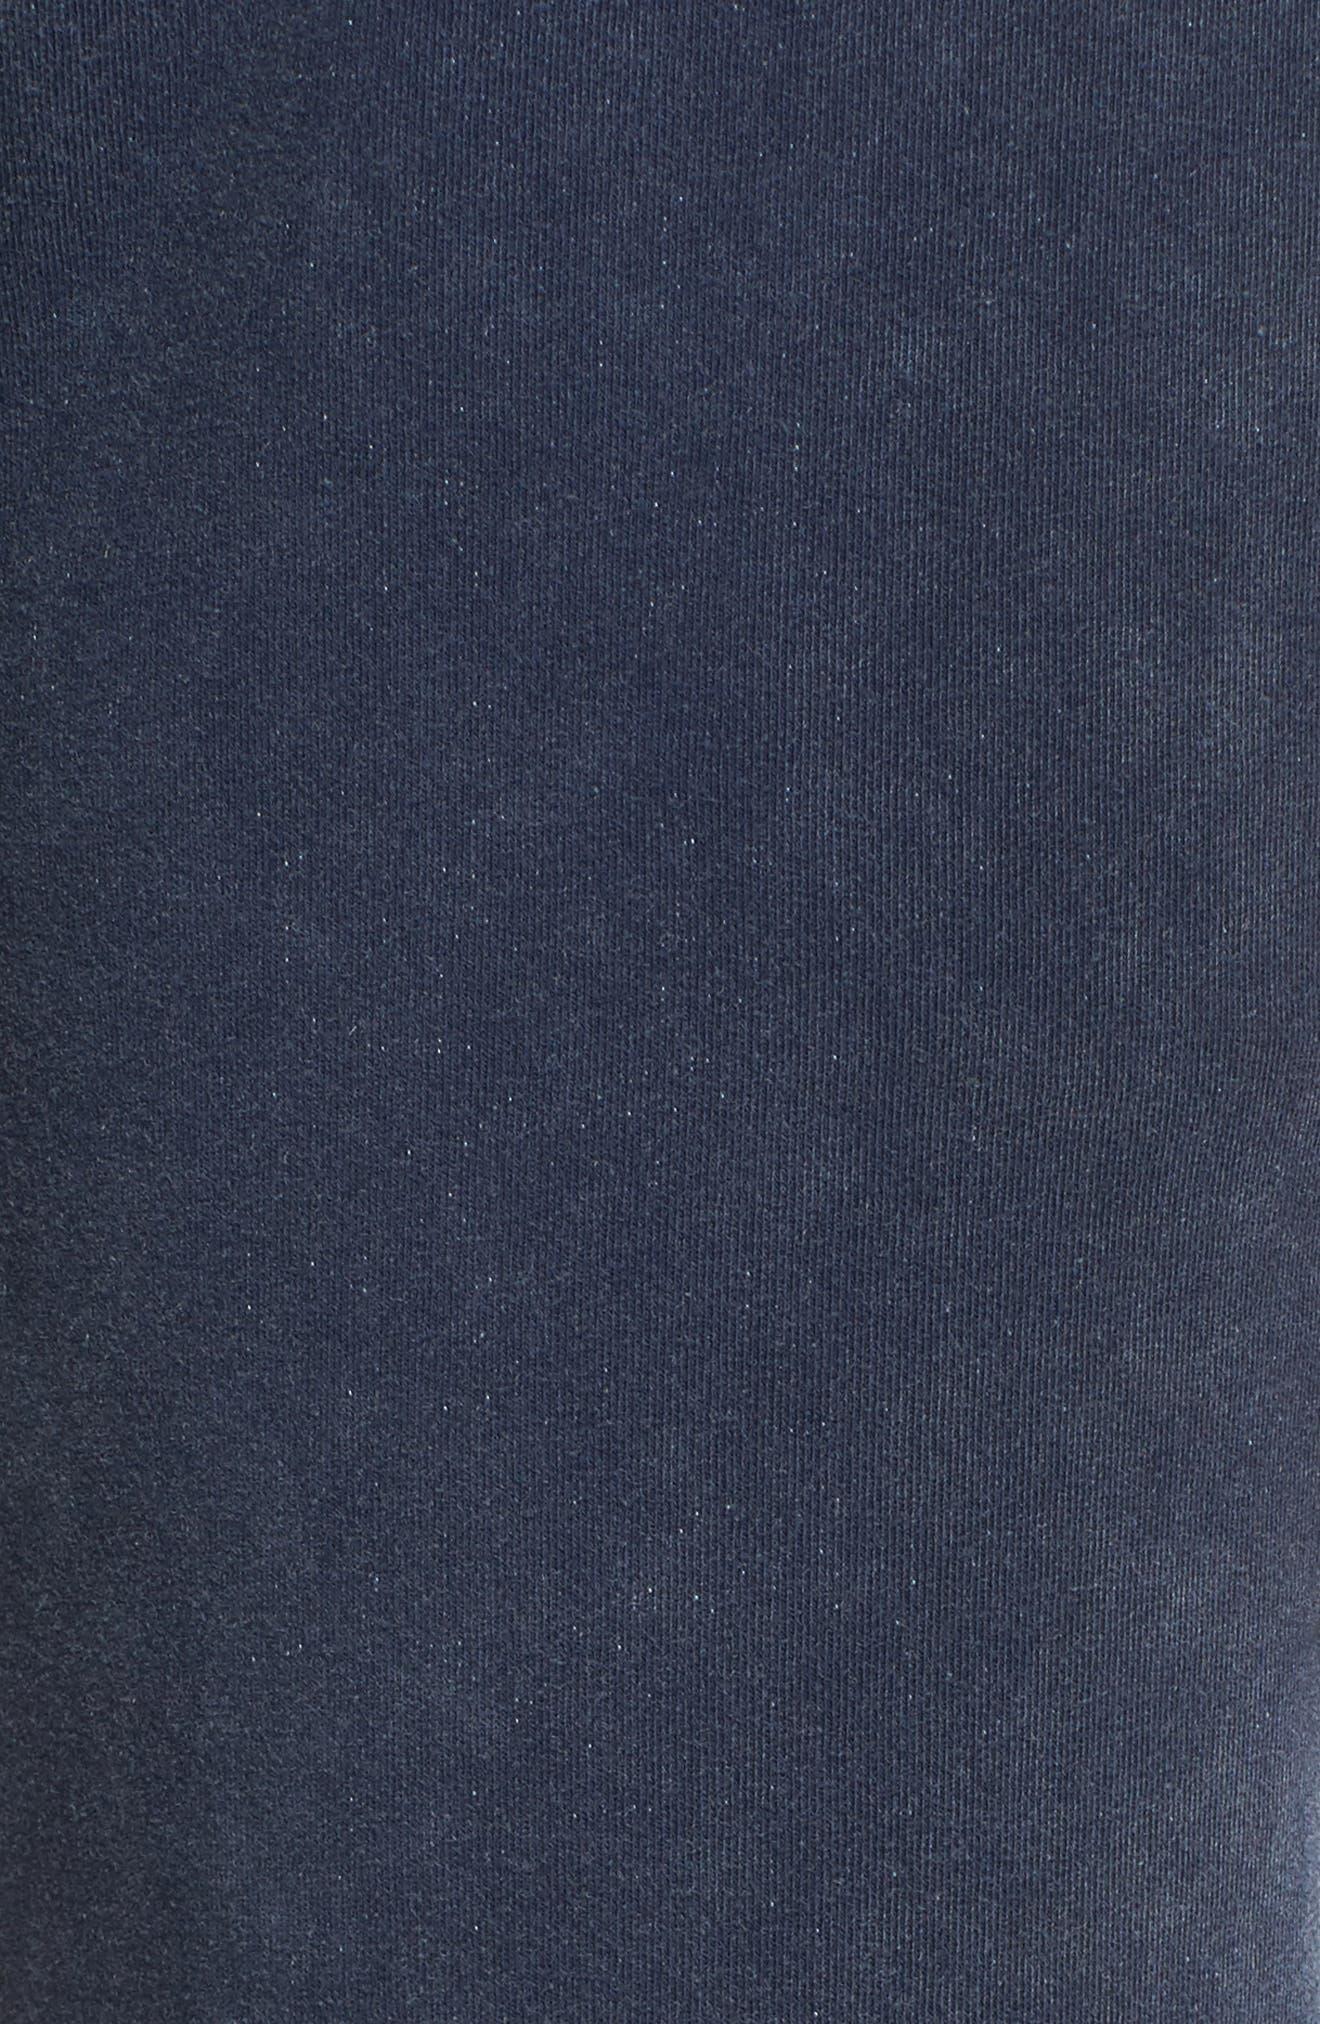 Lounge Pants,                             Alternate thumbnail 10, color,